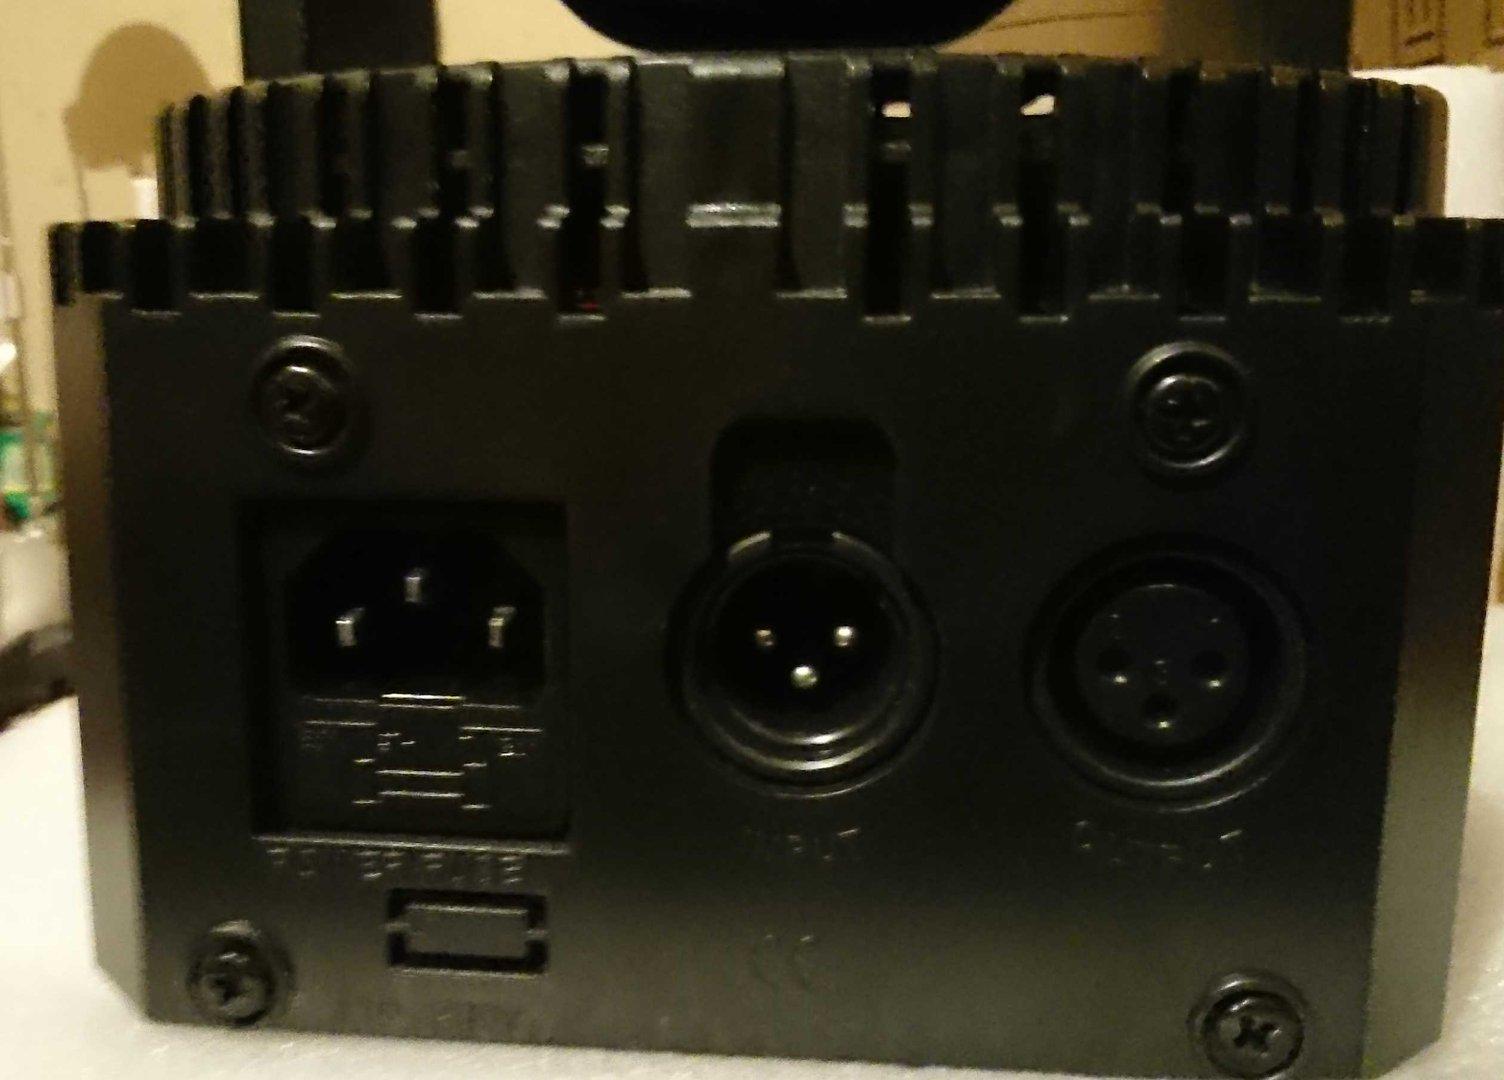 Spiksplinternieuw LED LICHT SHOW LCD DMX F078 7x10W RGBW 4in1 Wash Moving Head LED DP-59